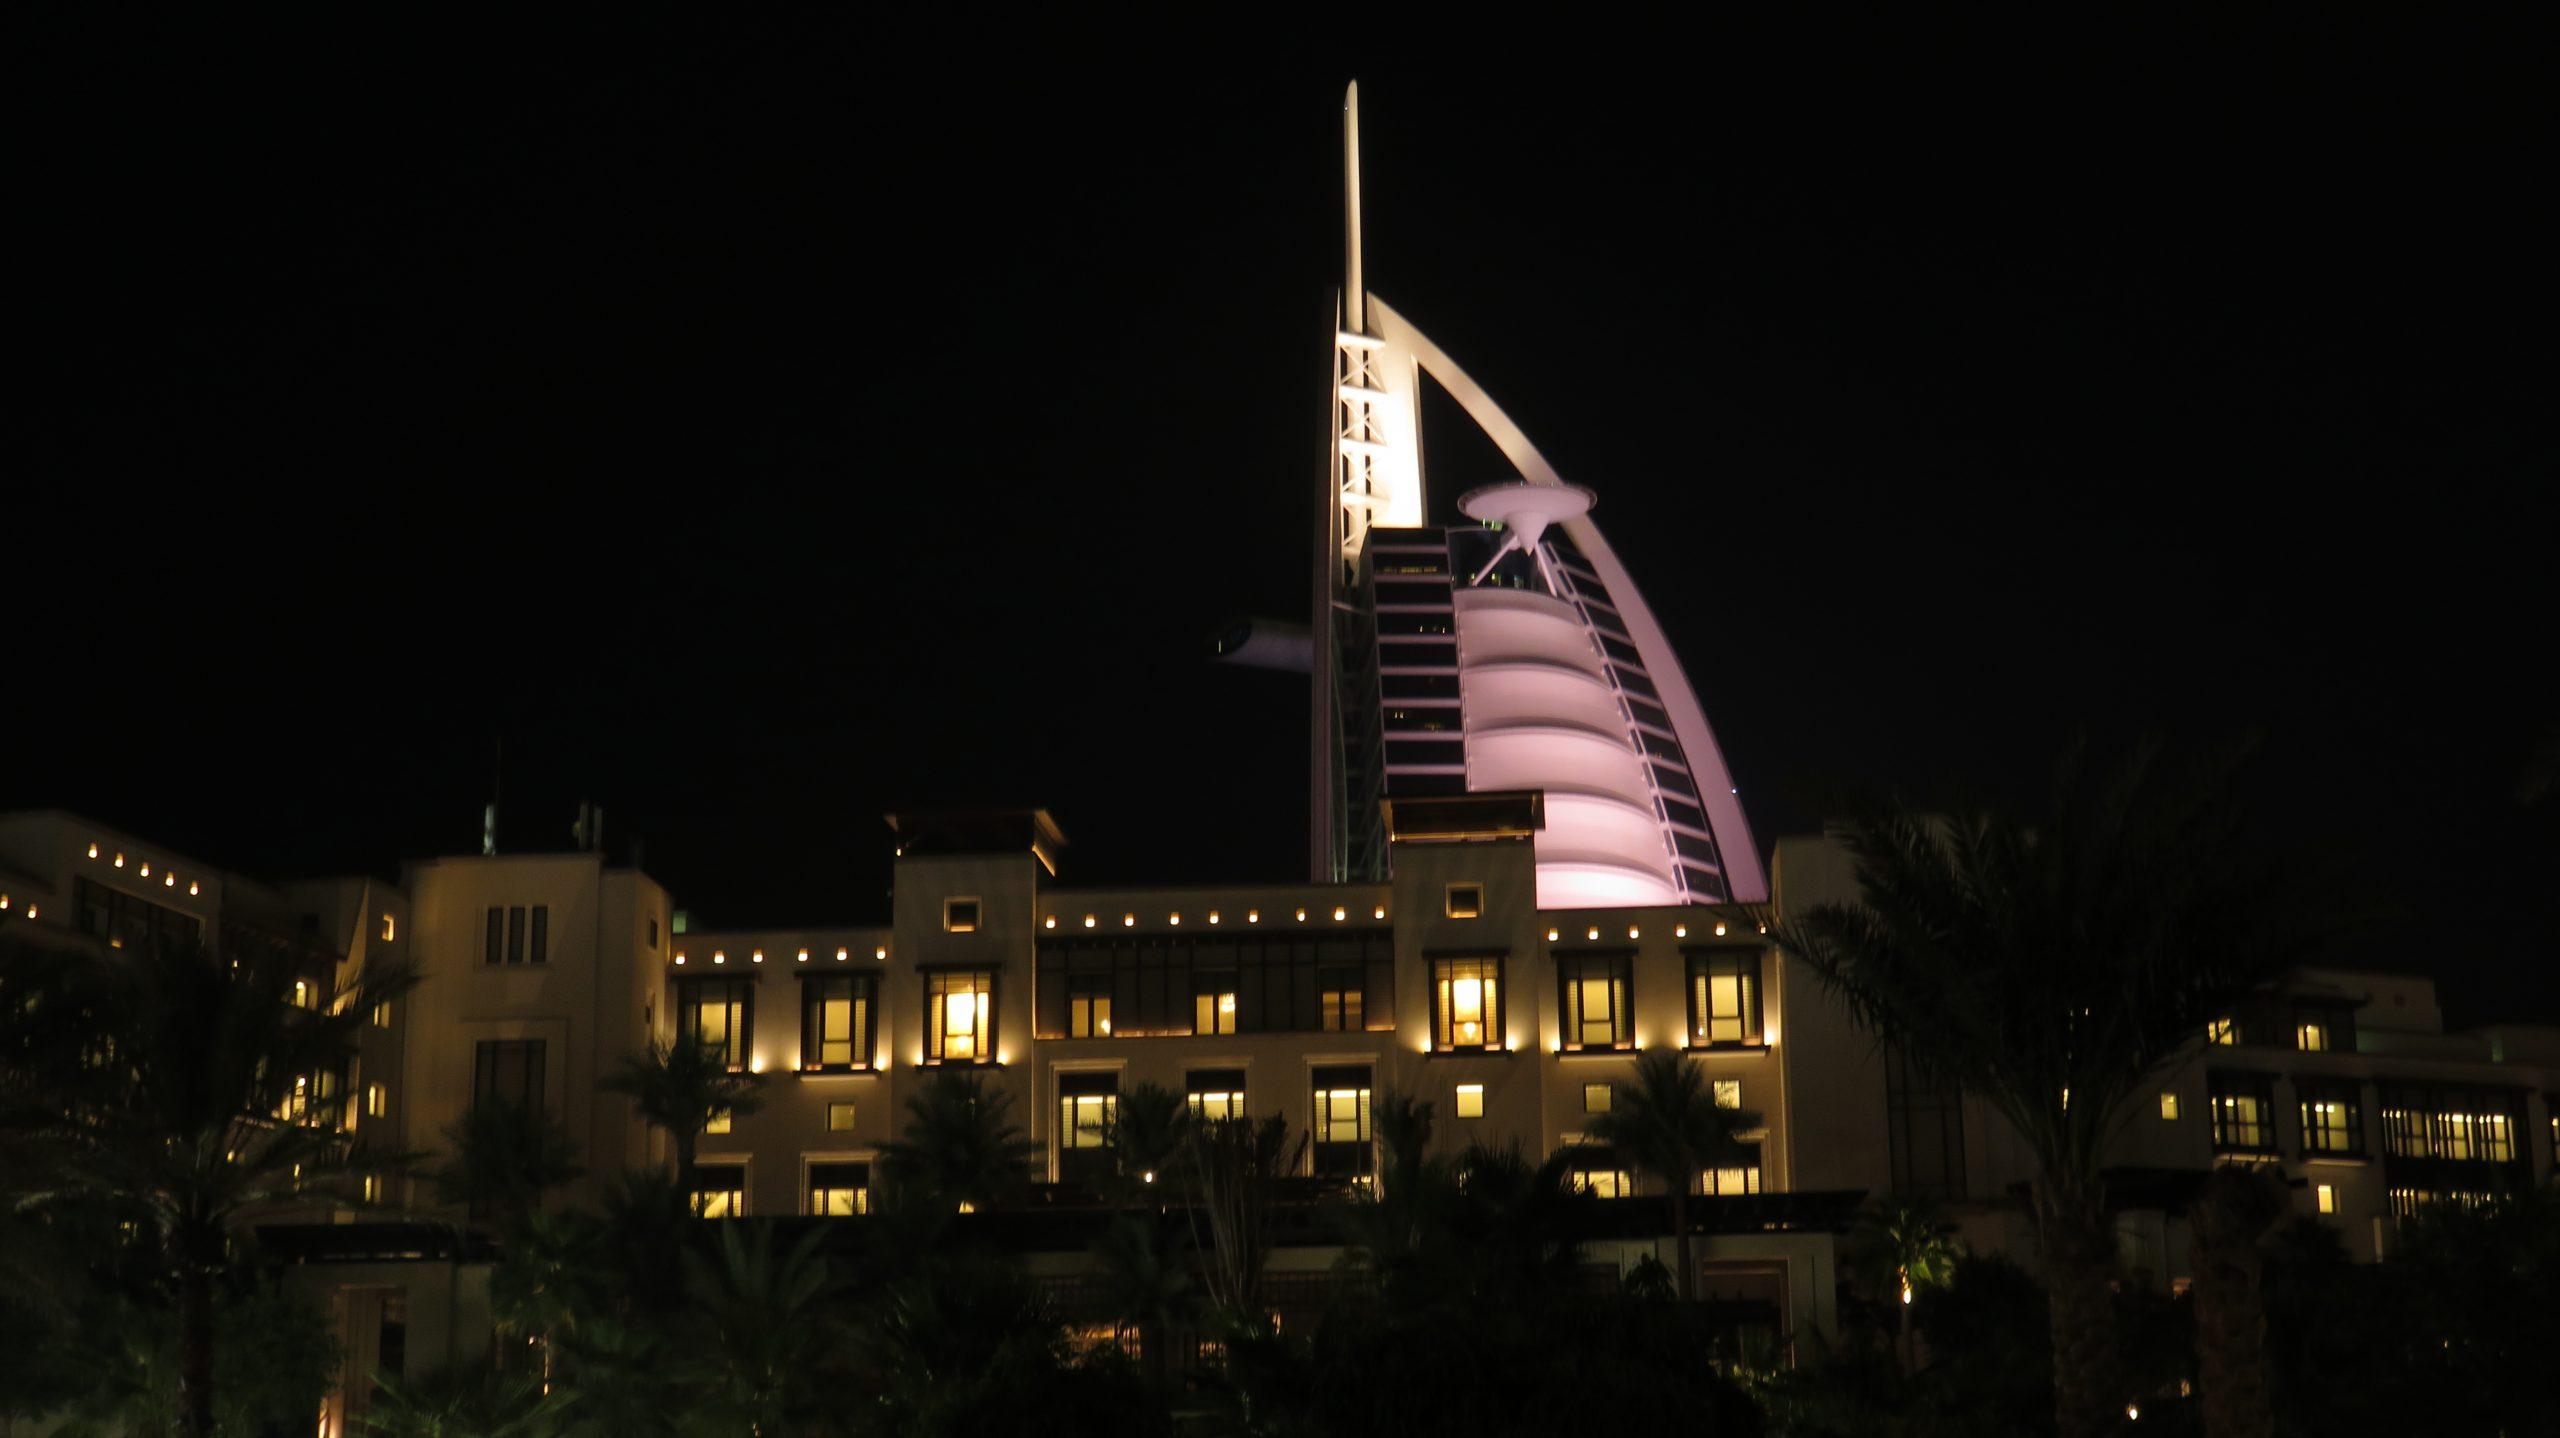 Night Shot of the Hotel